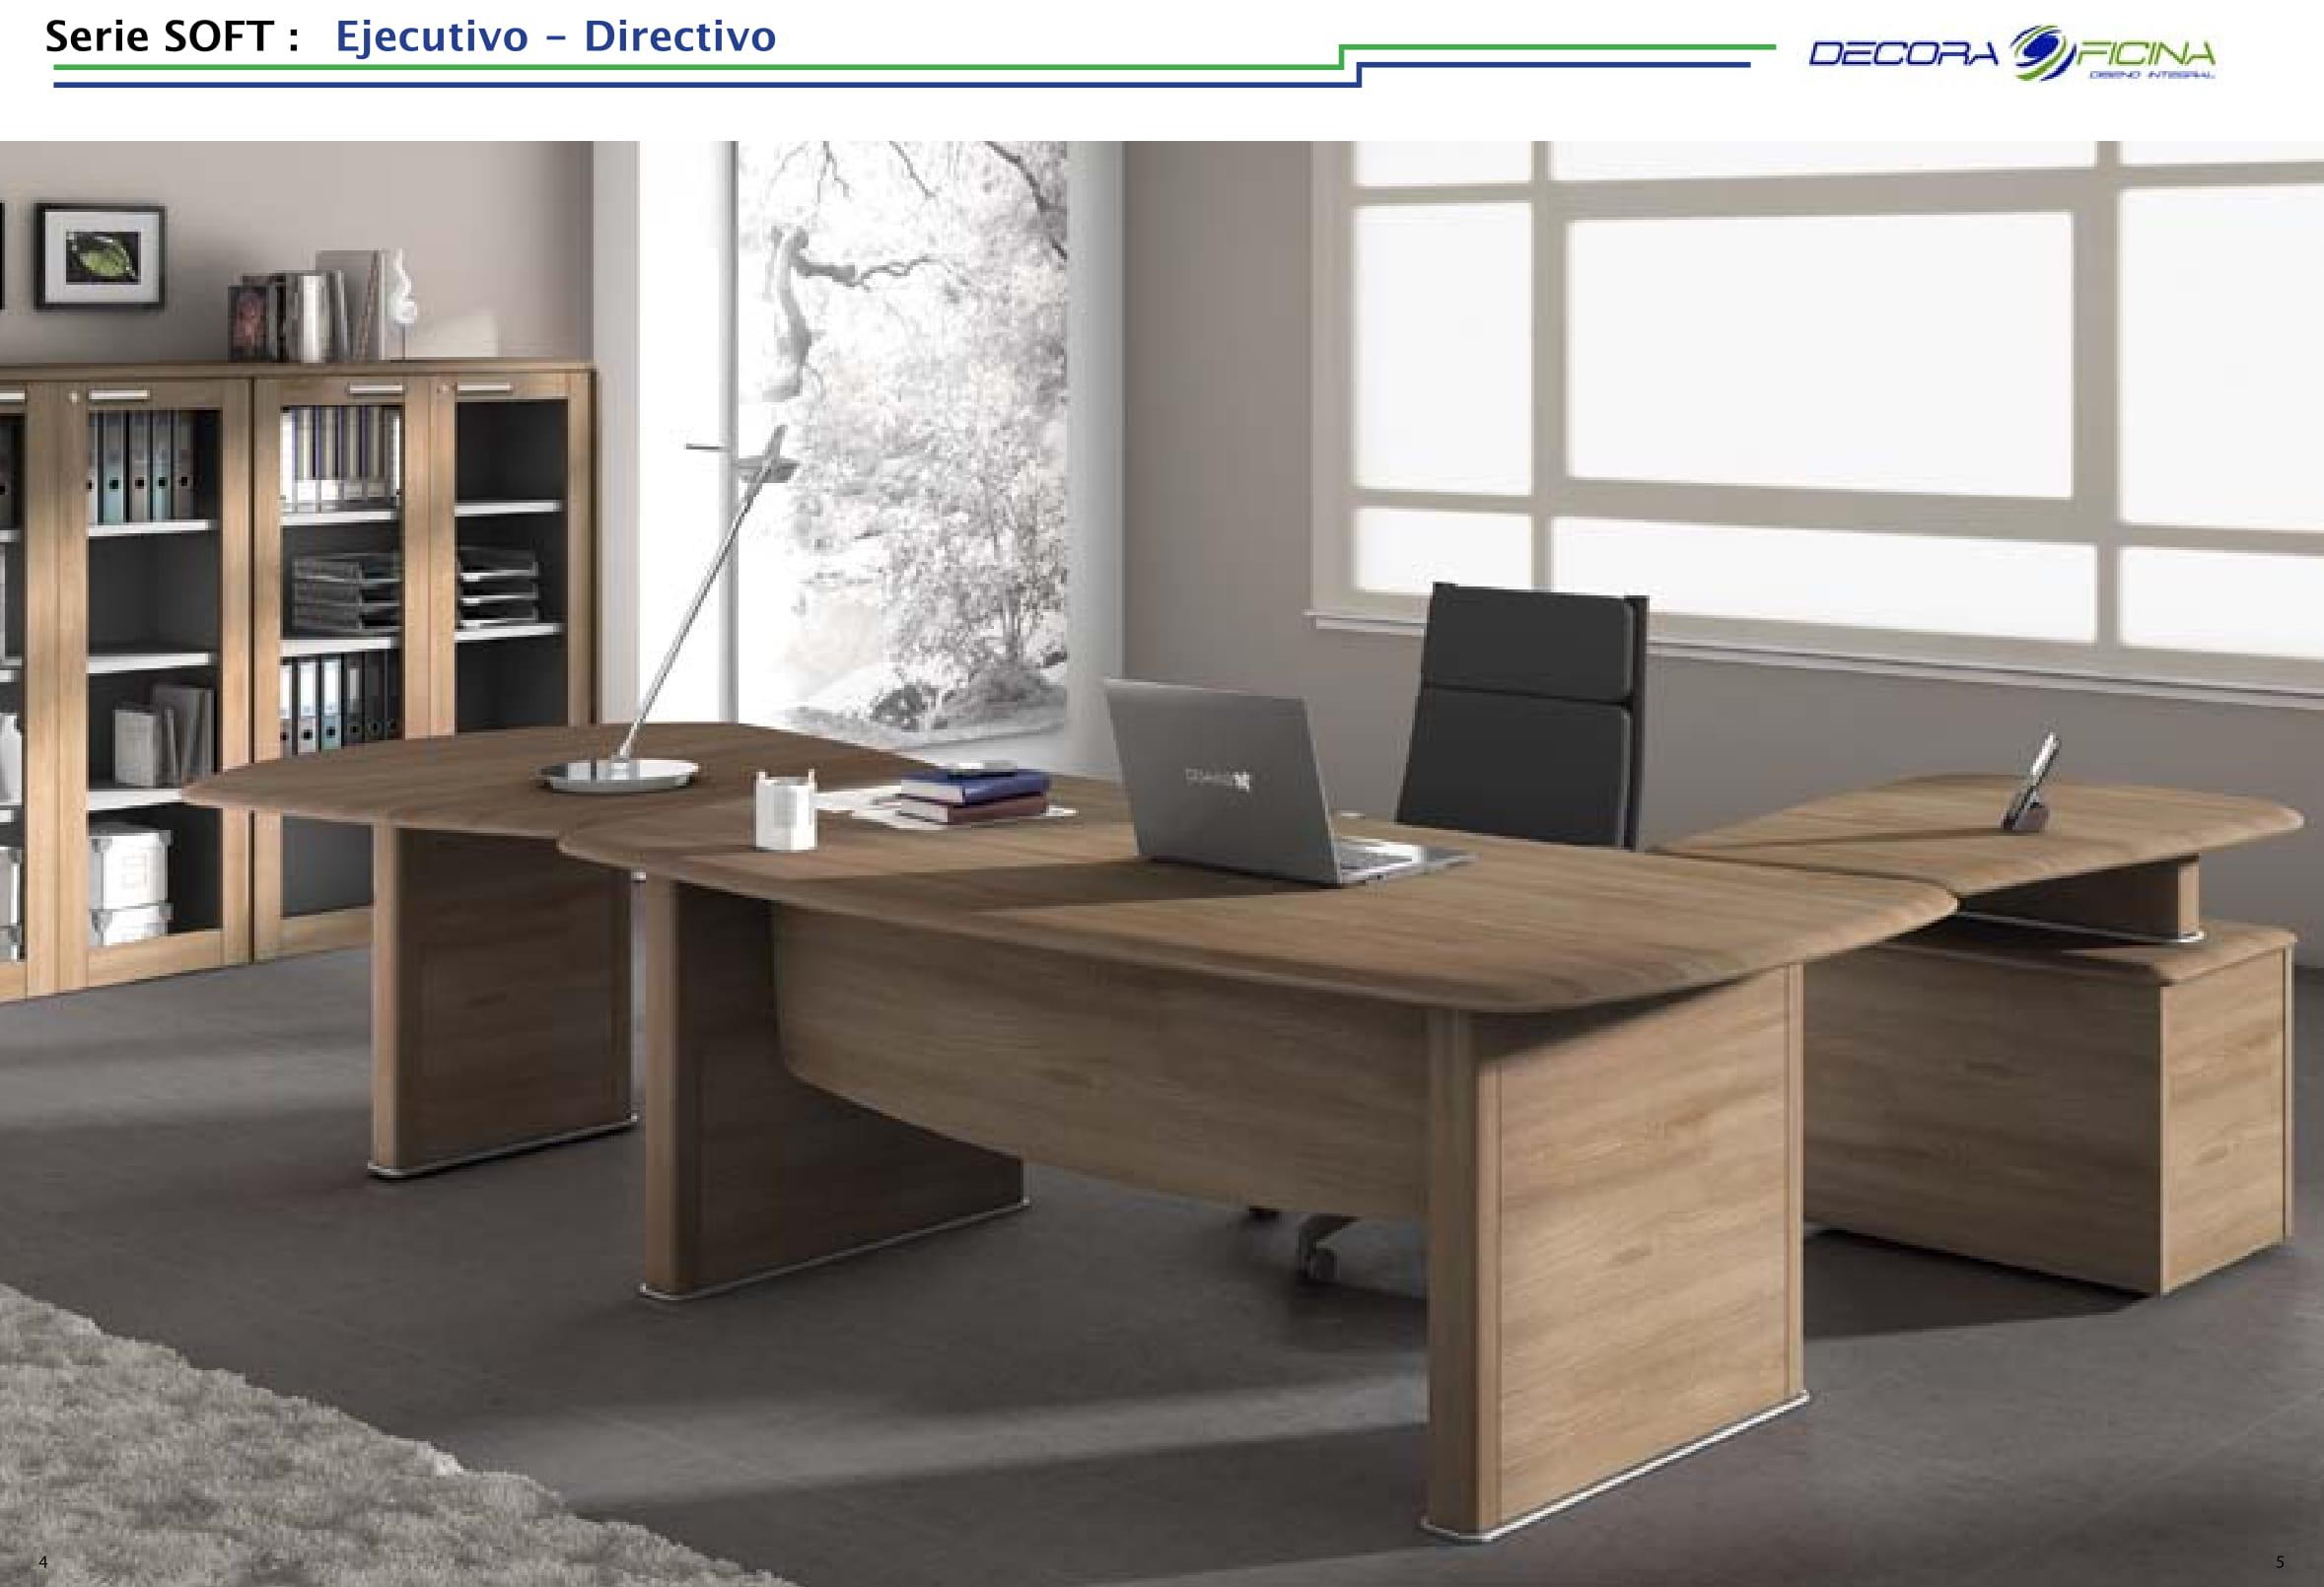 Muebles de despacho serie soft decoraoficina for Muebles para despacho